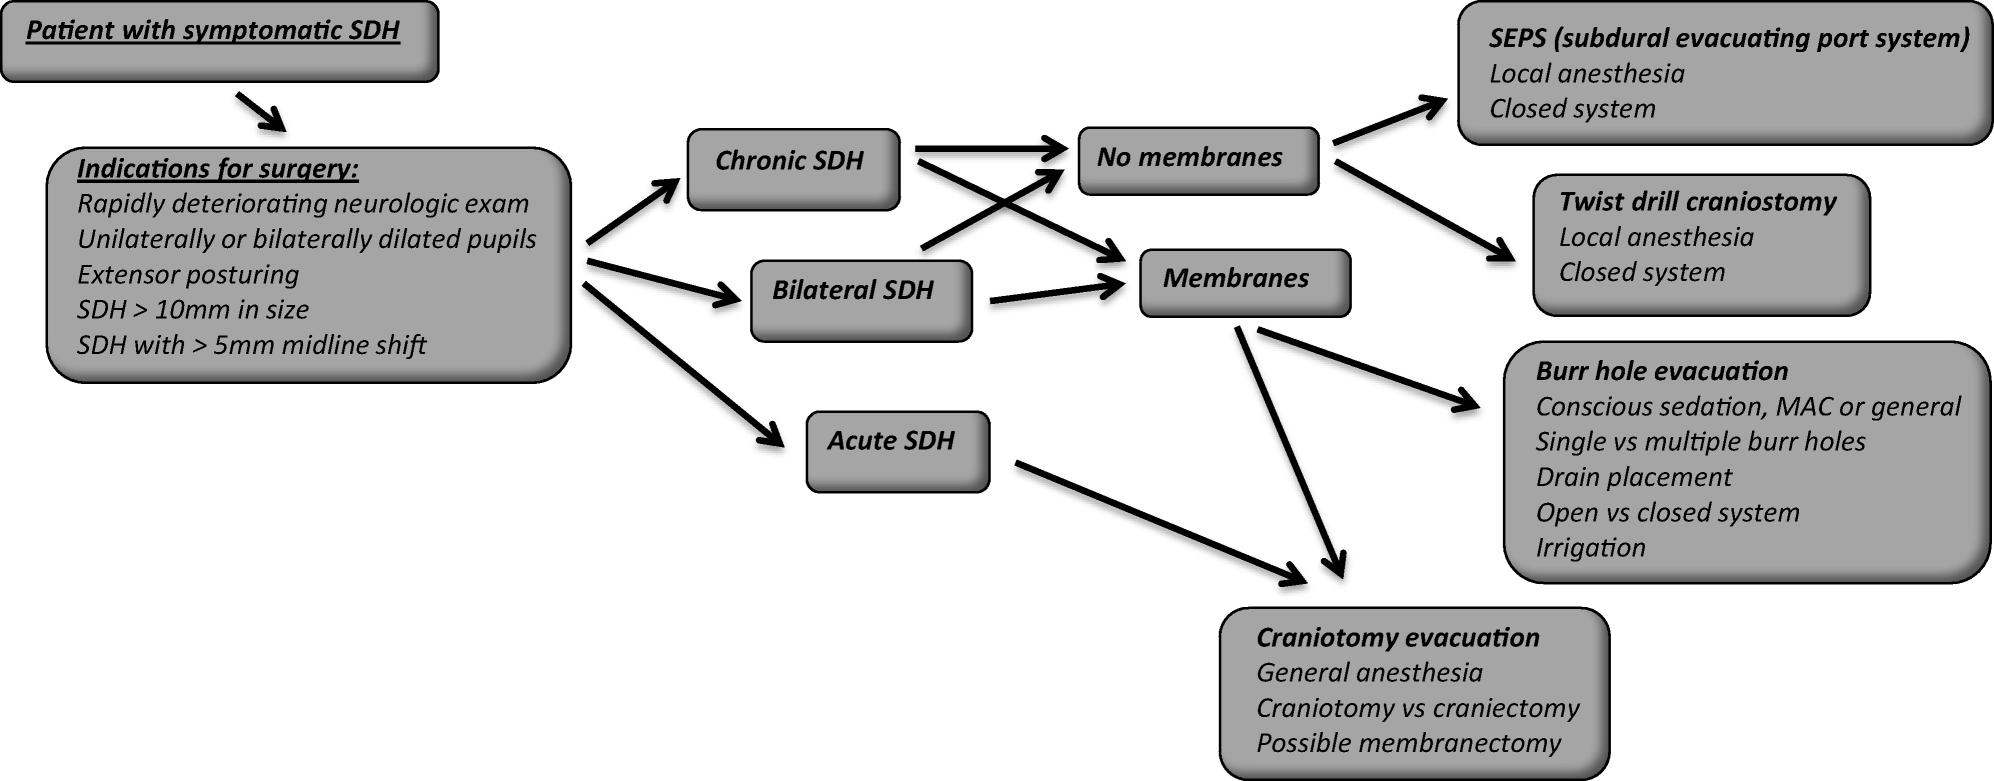 Management of Subdural Hematomas: Part II  Surgical Management of